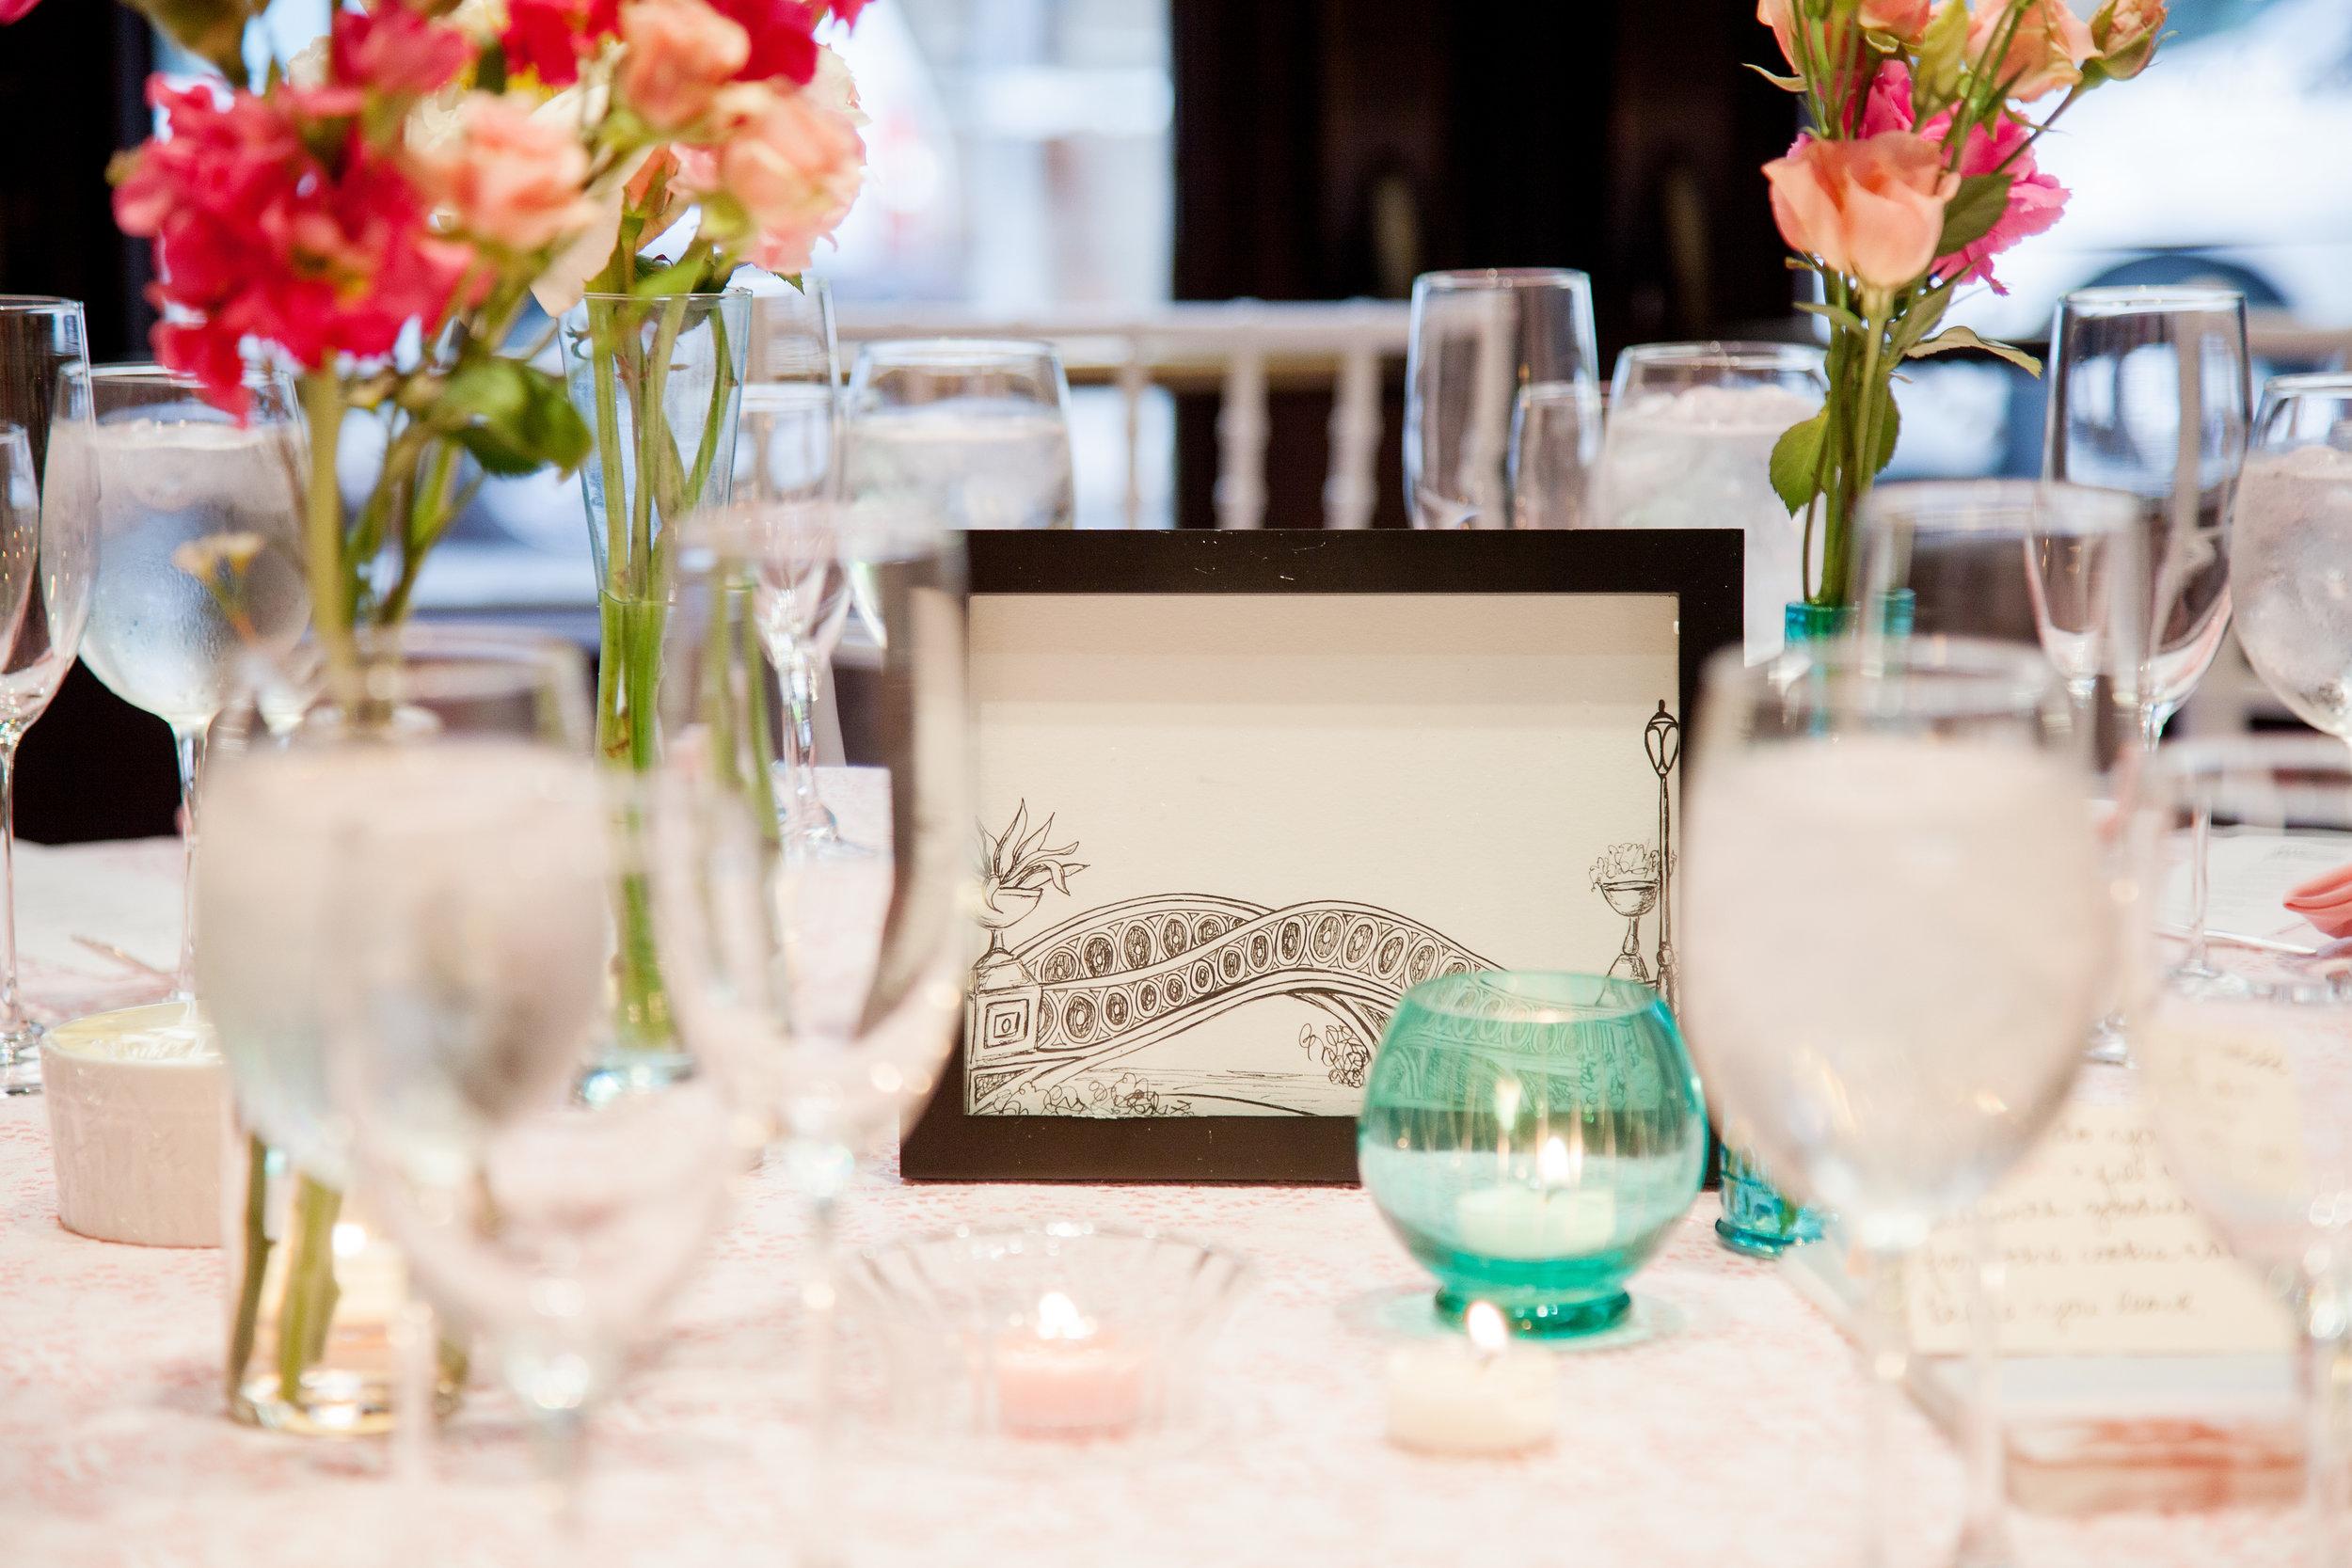 Pineapple Street Designs Stationery Illustrations for Weddings (4).jpg